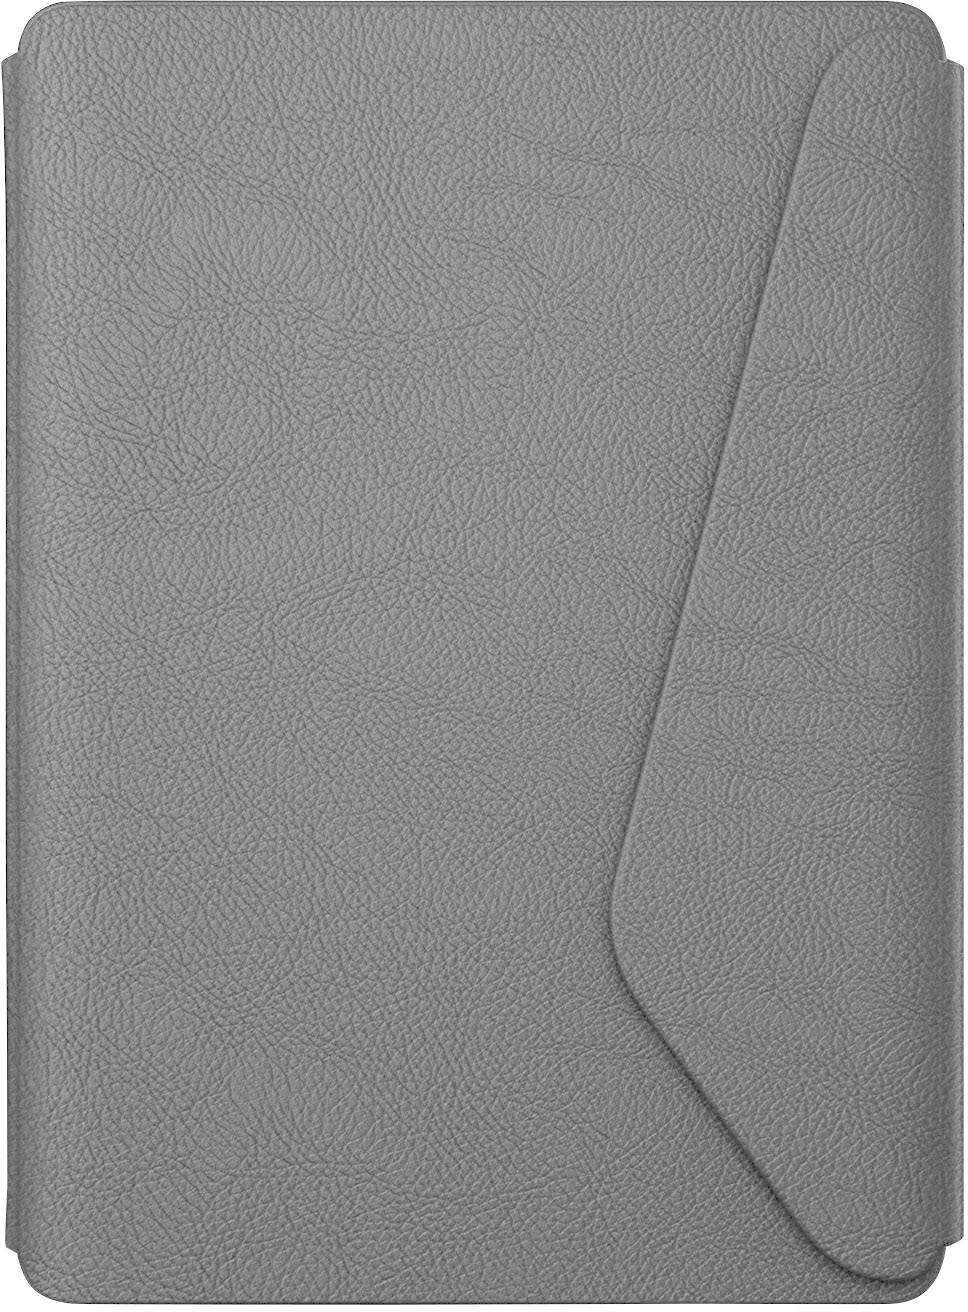 Kobo Aura Edition 2 SleepCover schwarz (N236-AC-BK-E-PU)